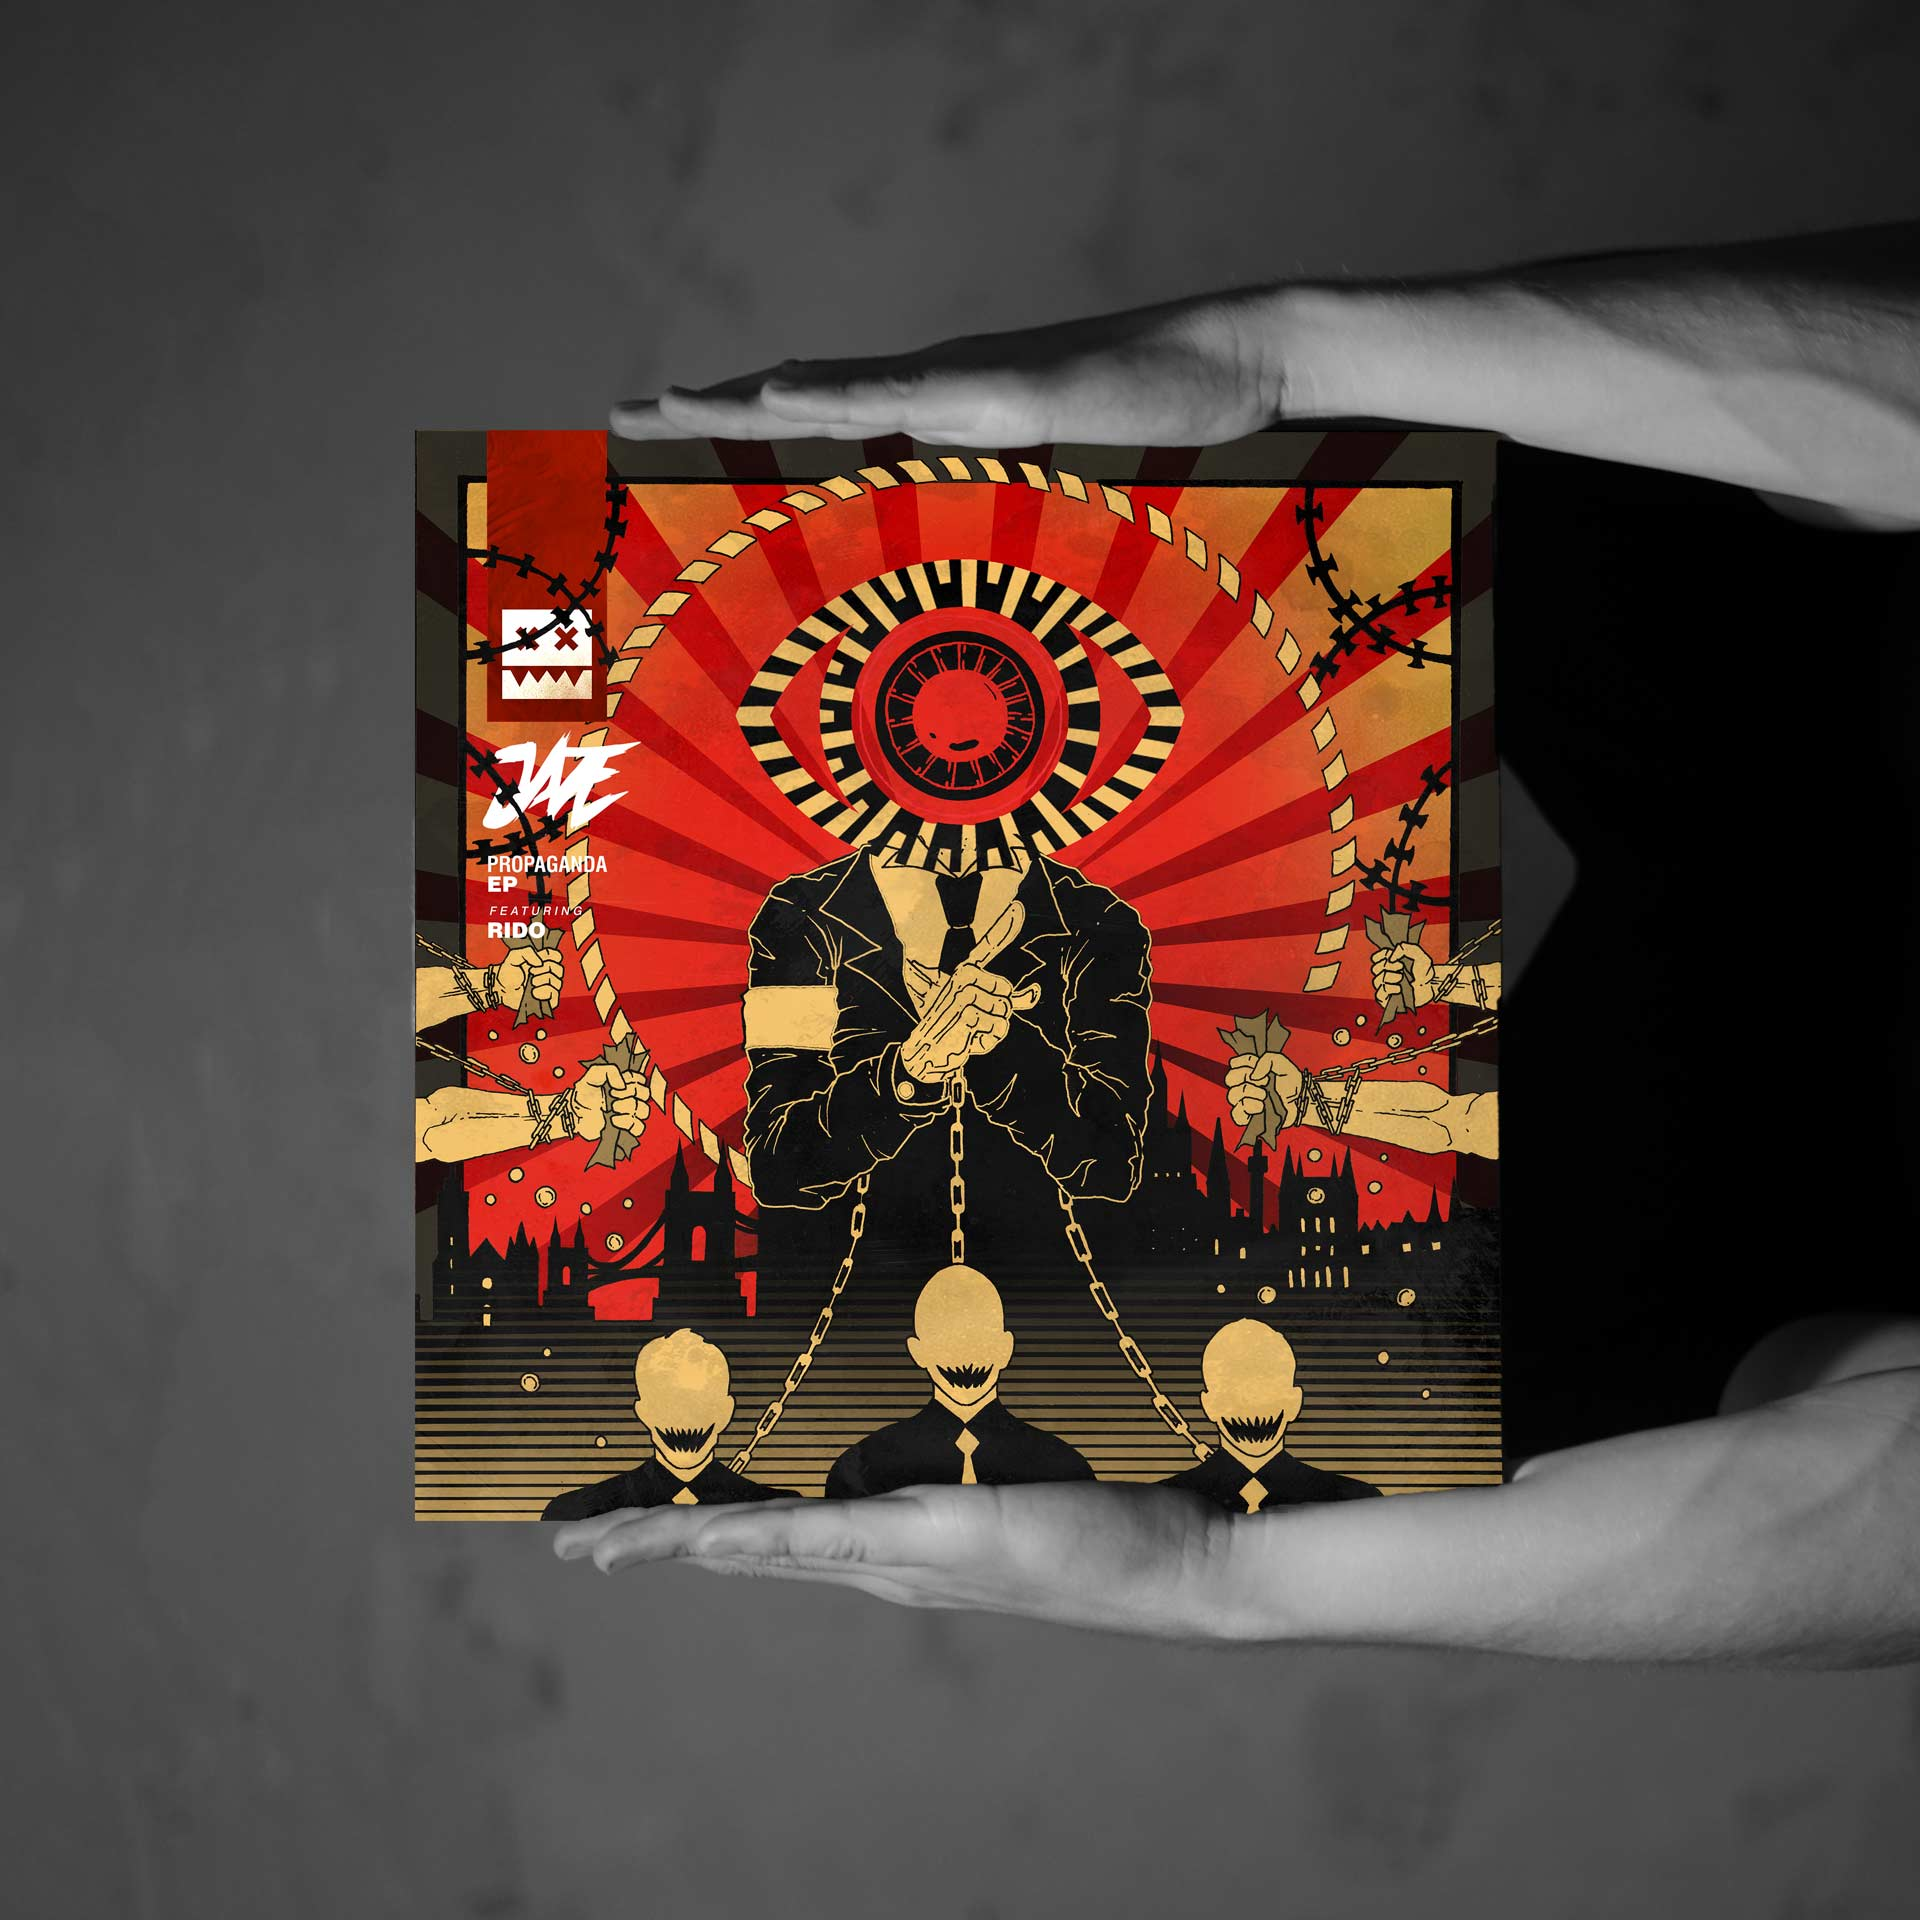 Umuts Selektion der Woche 007 • Jade – Propaganda EP [EATBRAIN066]